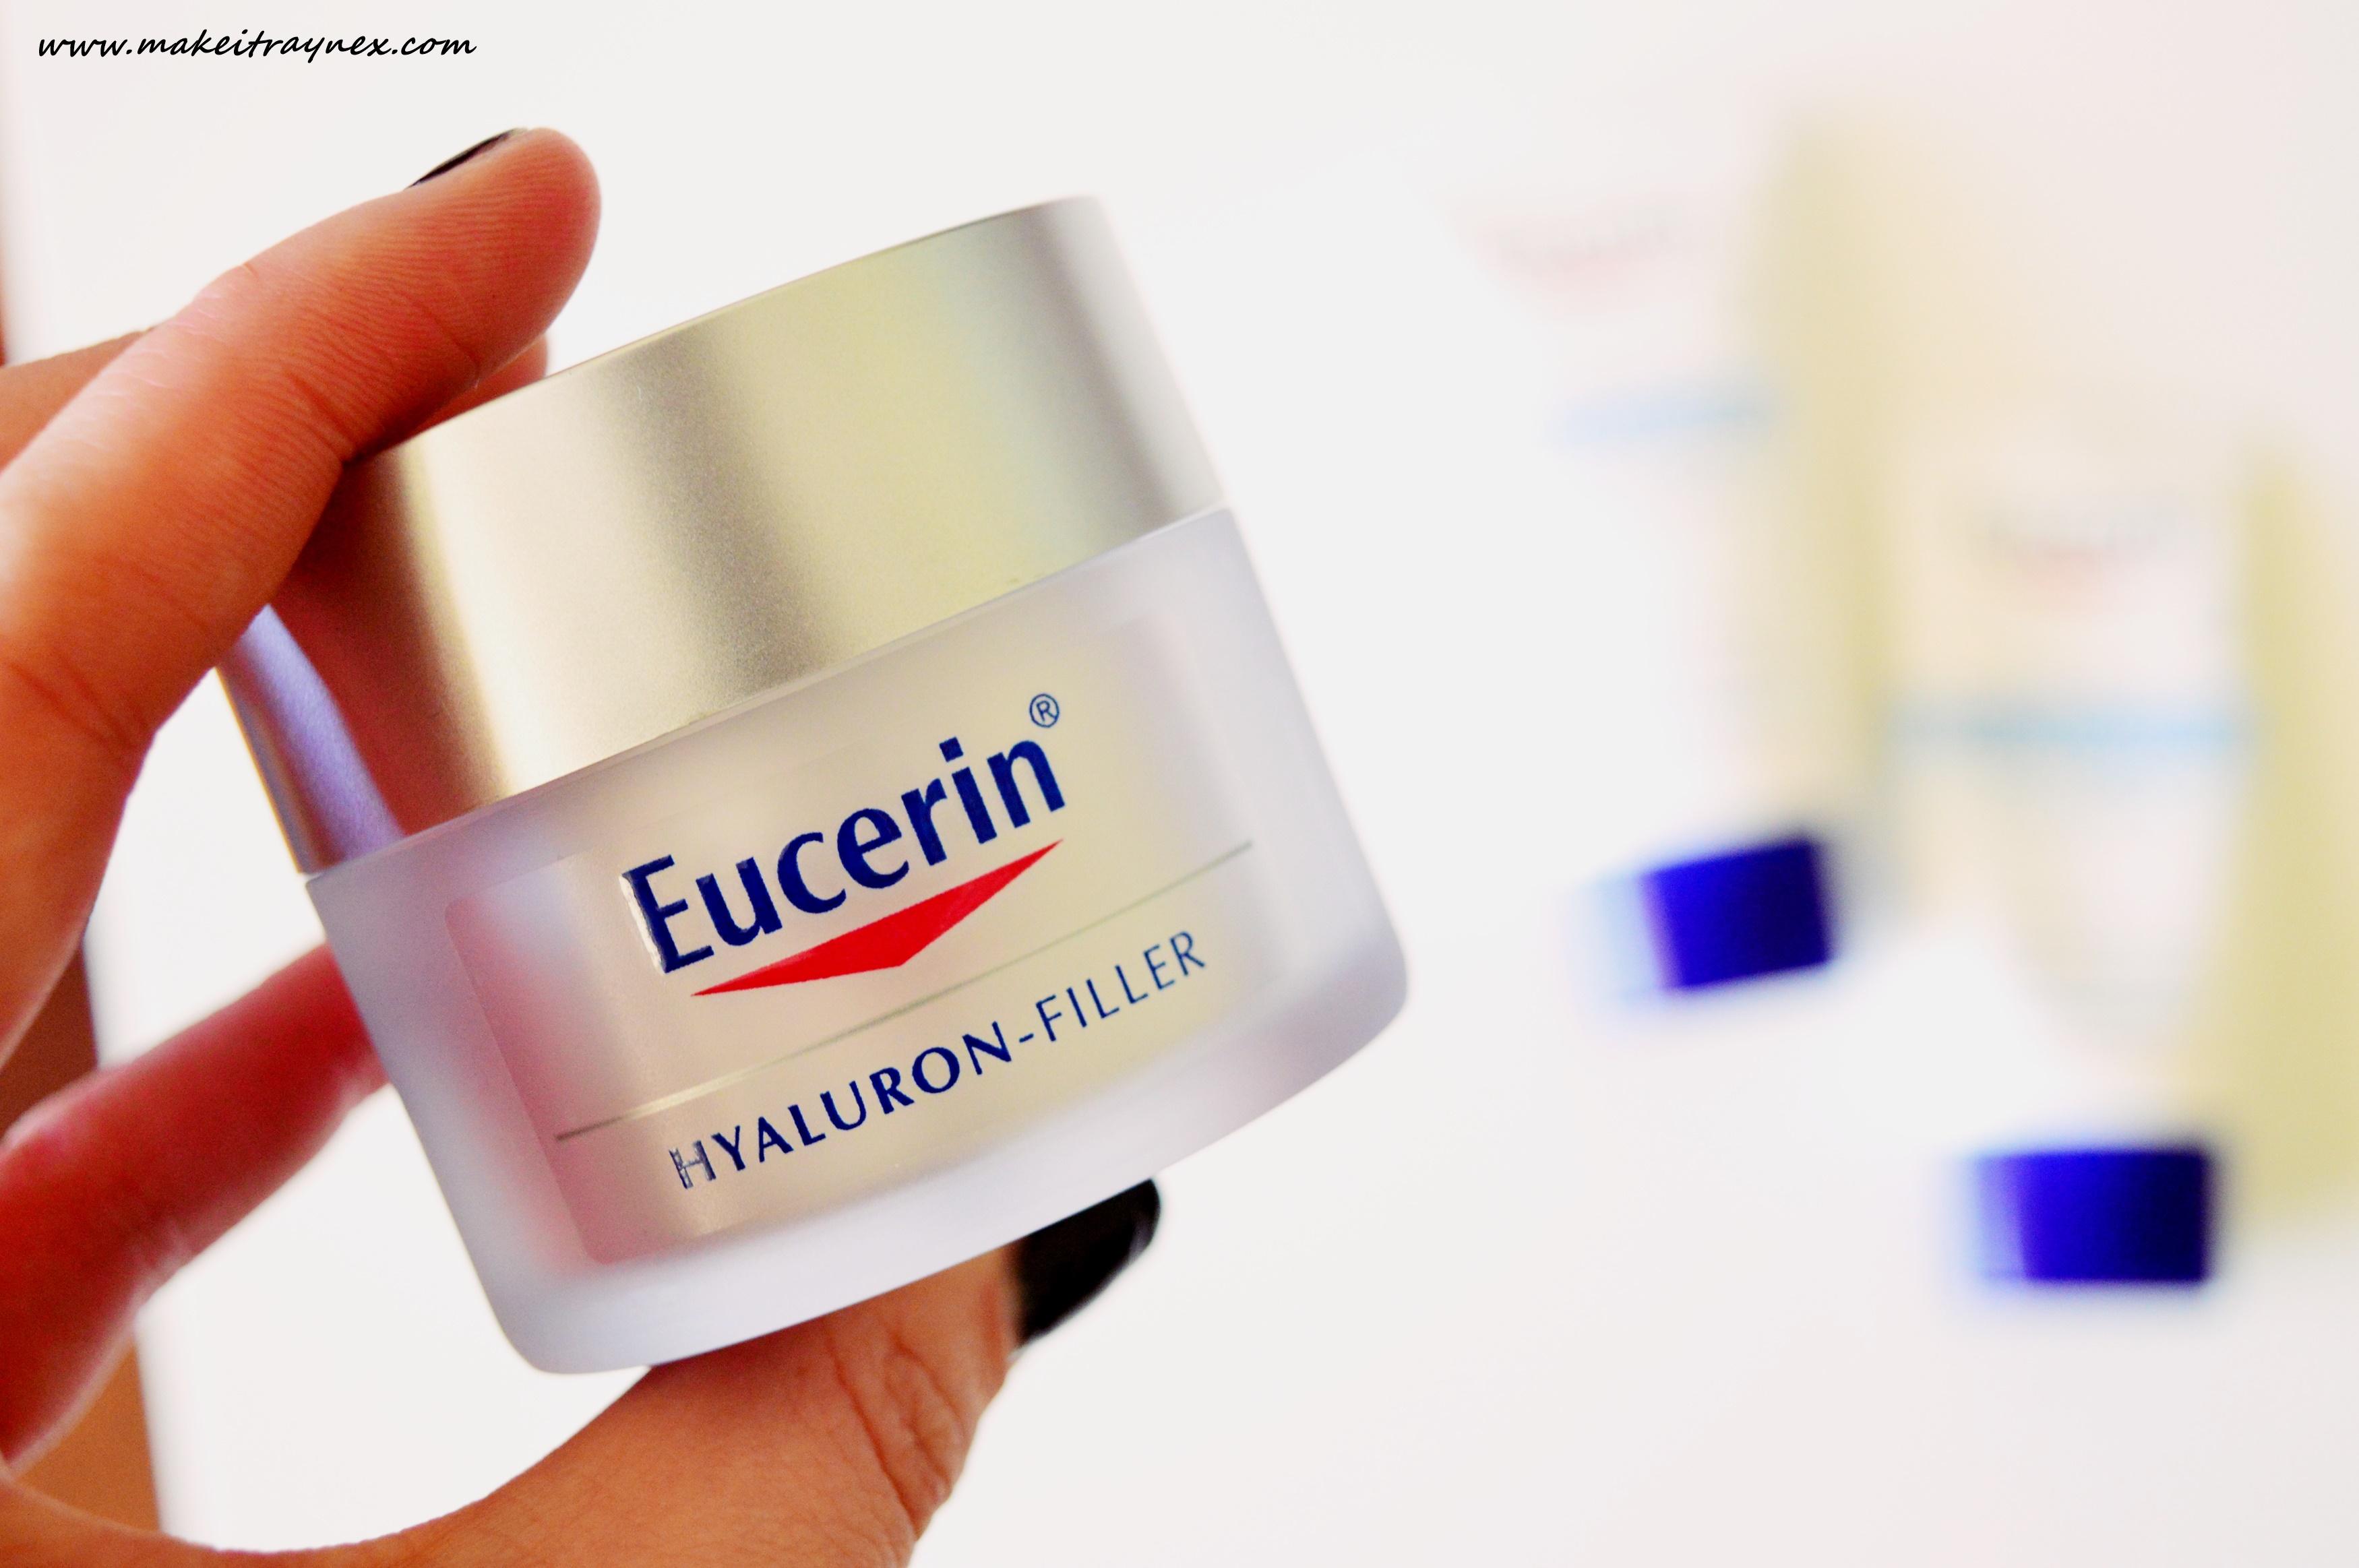 Hyaluron – Filler & Replenishing Face Cream from Eucerin {REVIEW}